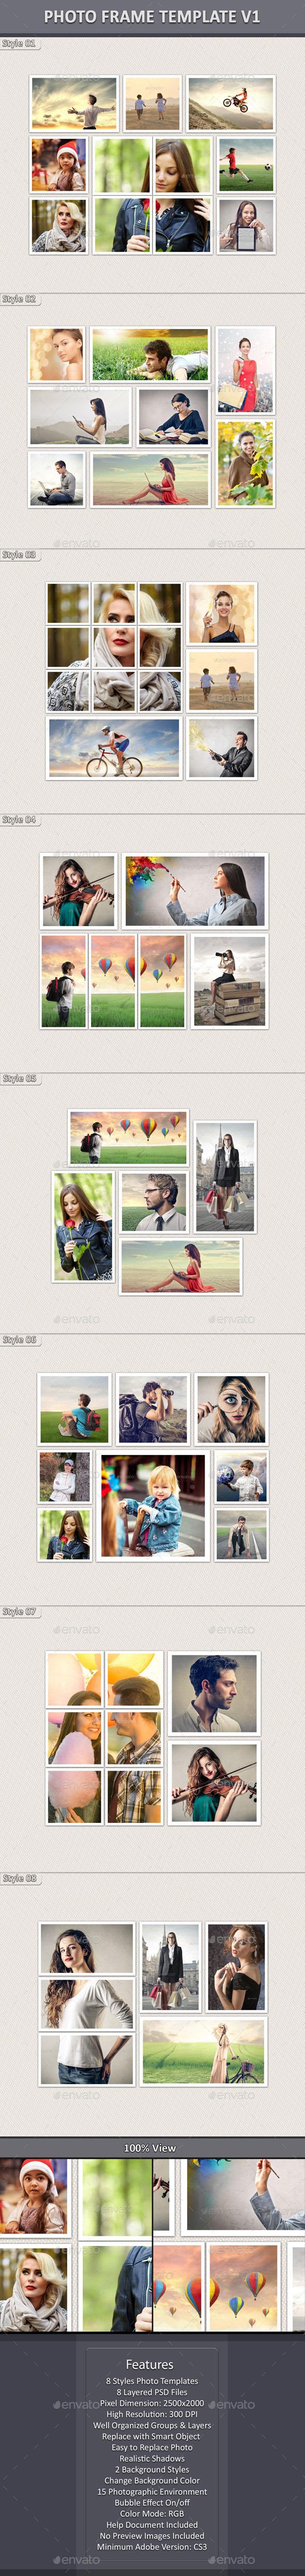 Photo Frame Template v1 - Miscellaneous Photo Templates